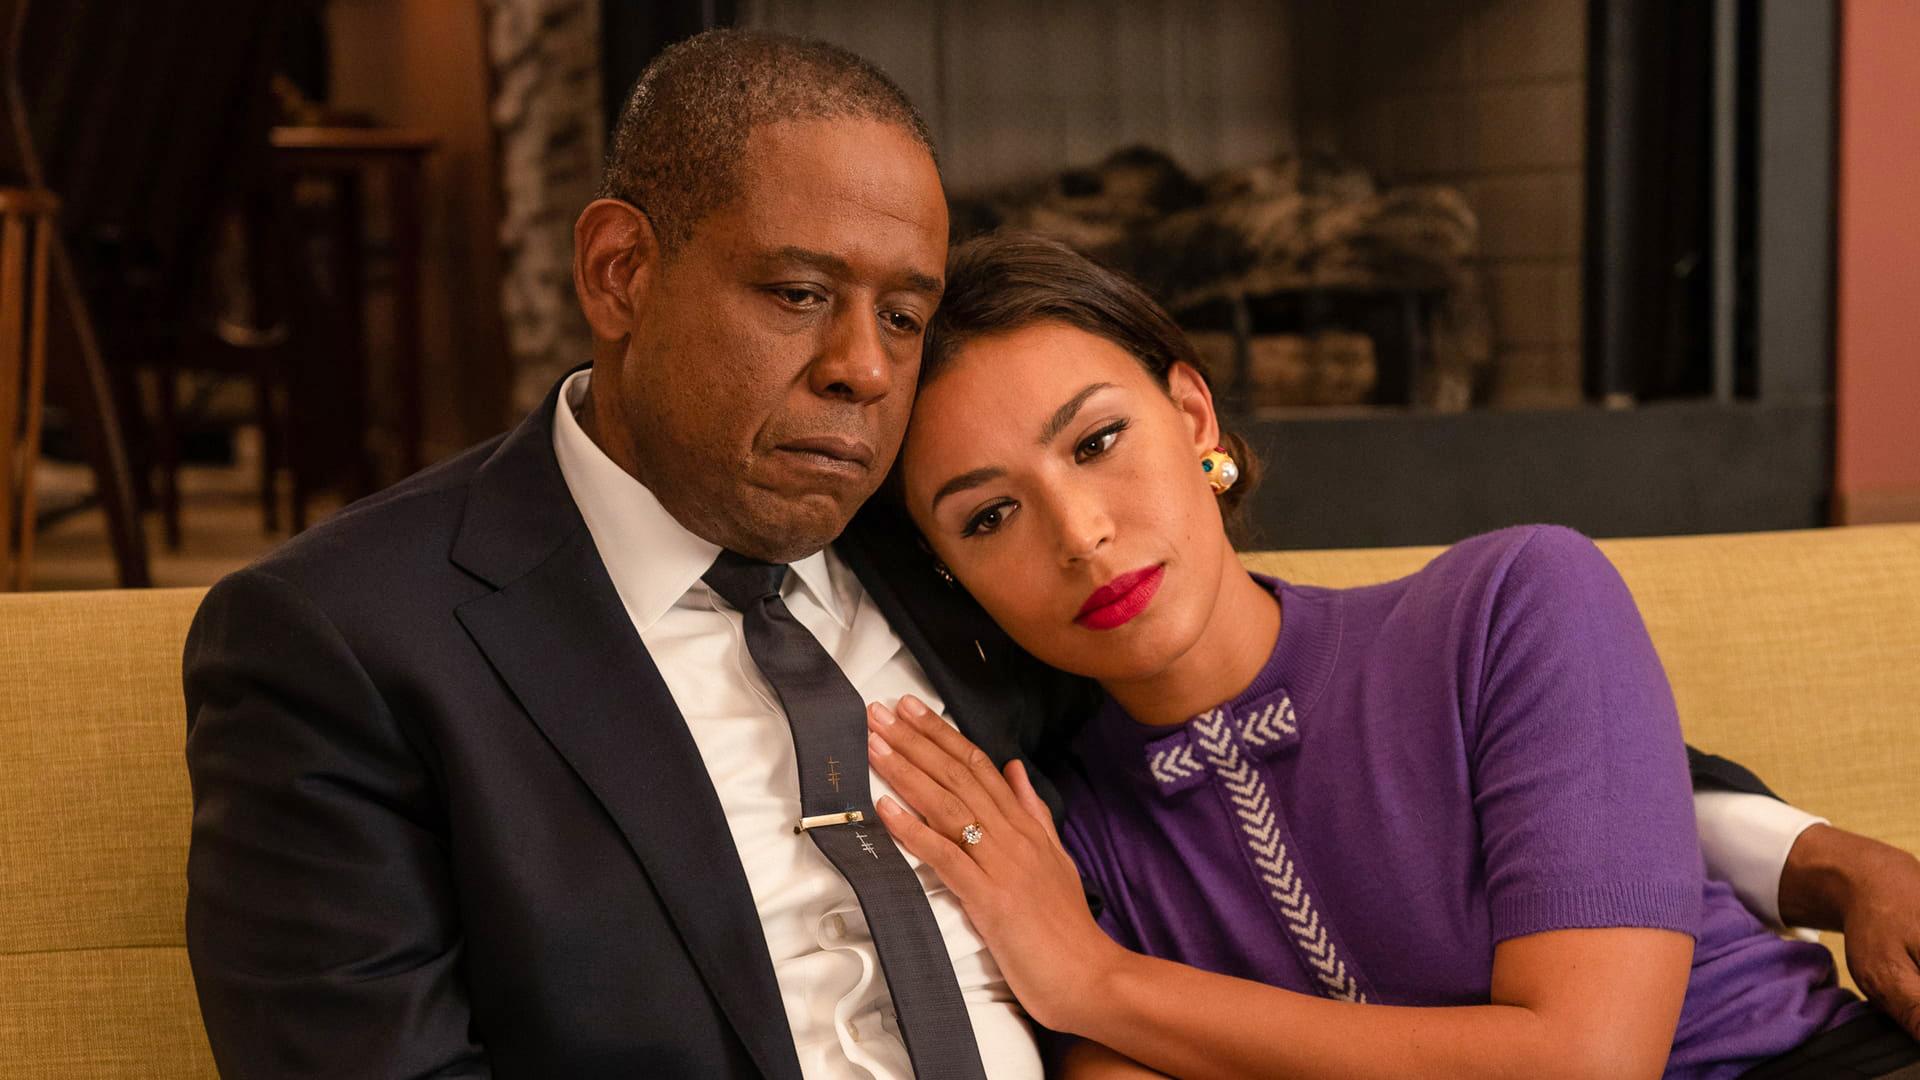 Godfather of Harlem Mayme Johnson